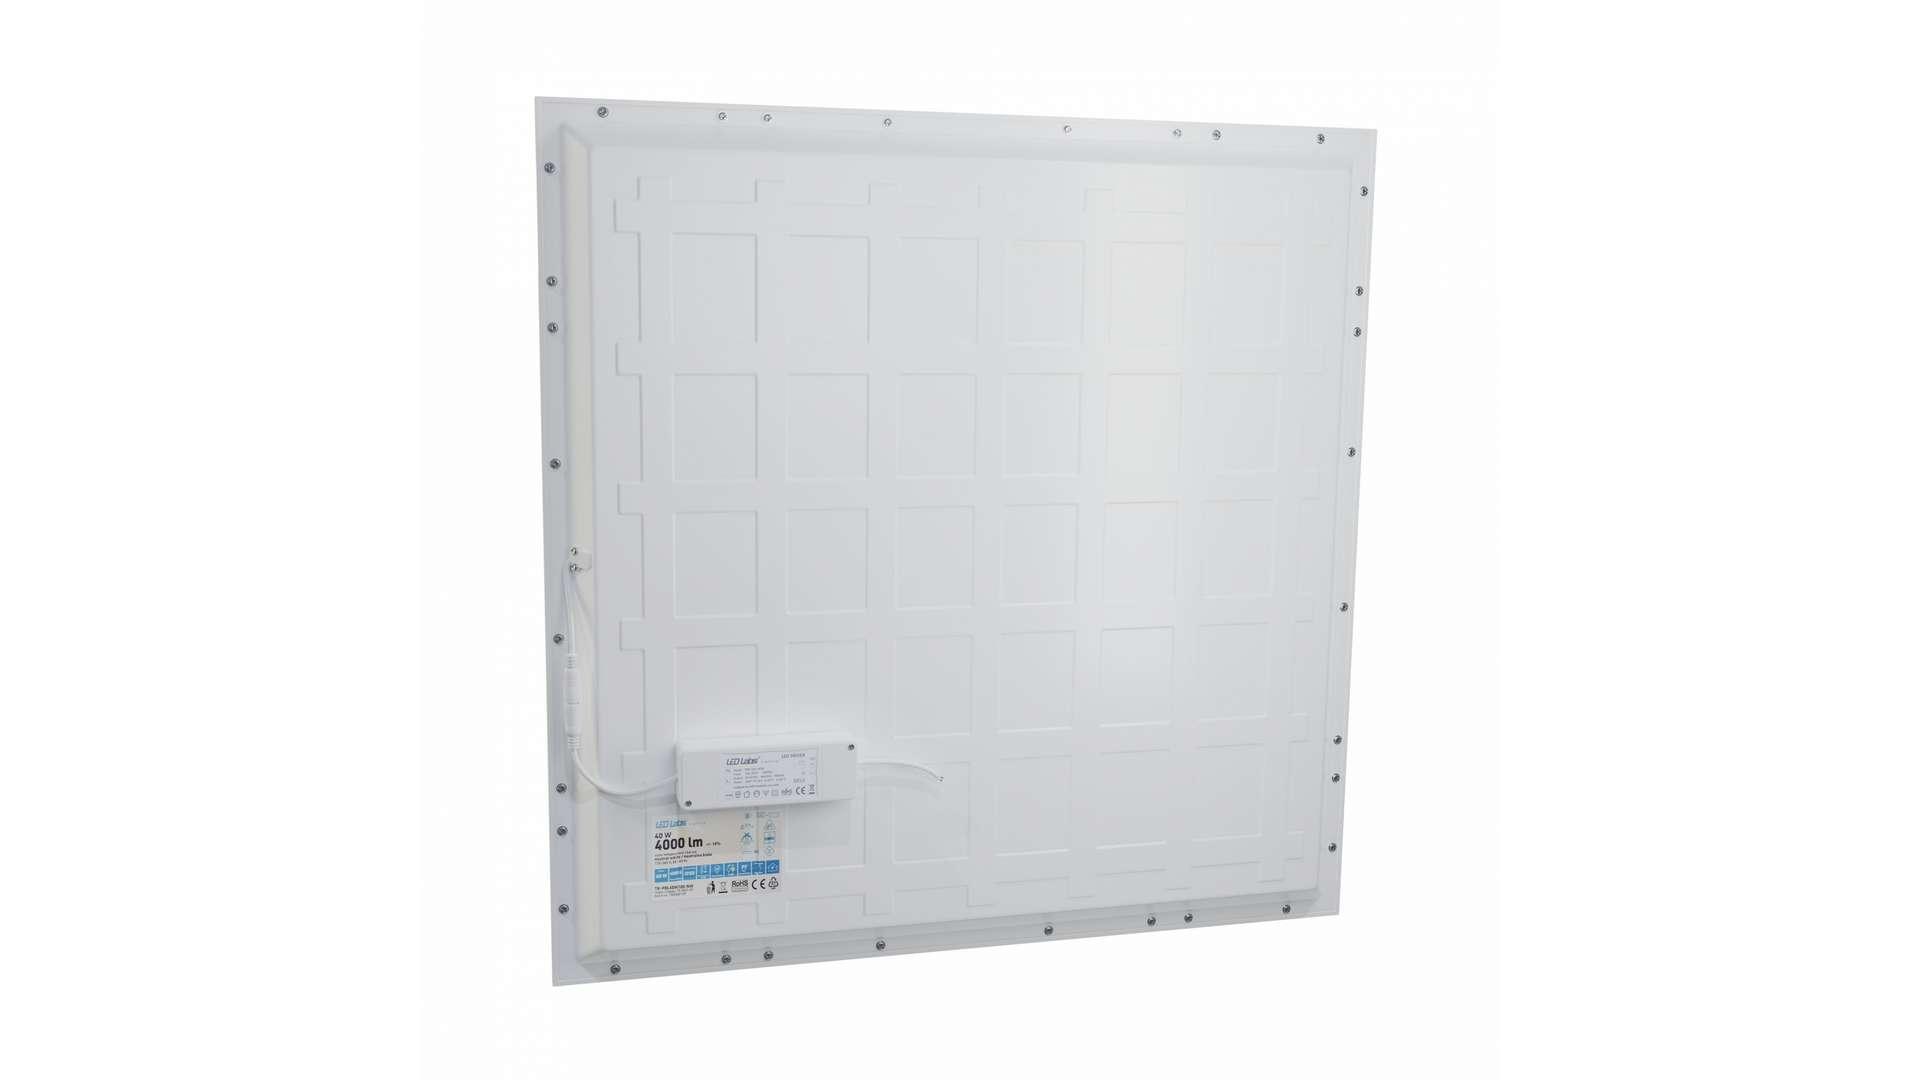 LED Panel Comet 40W SMD 60x60cm backlit neutral white